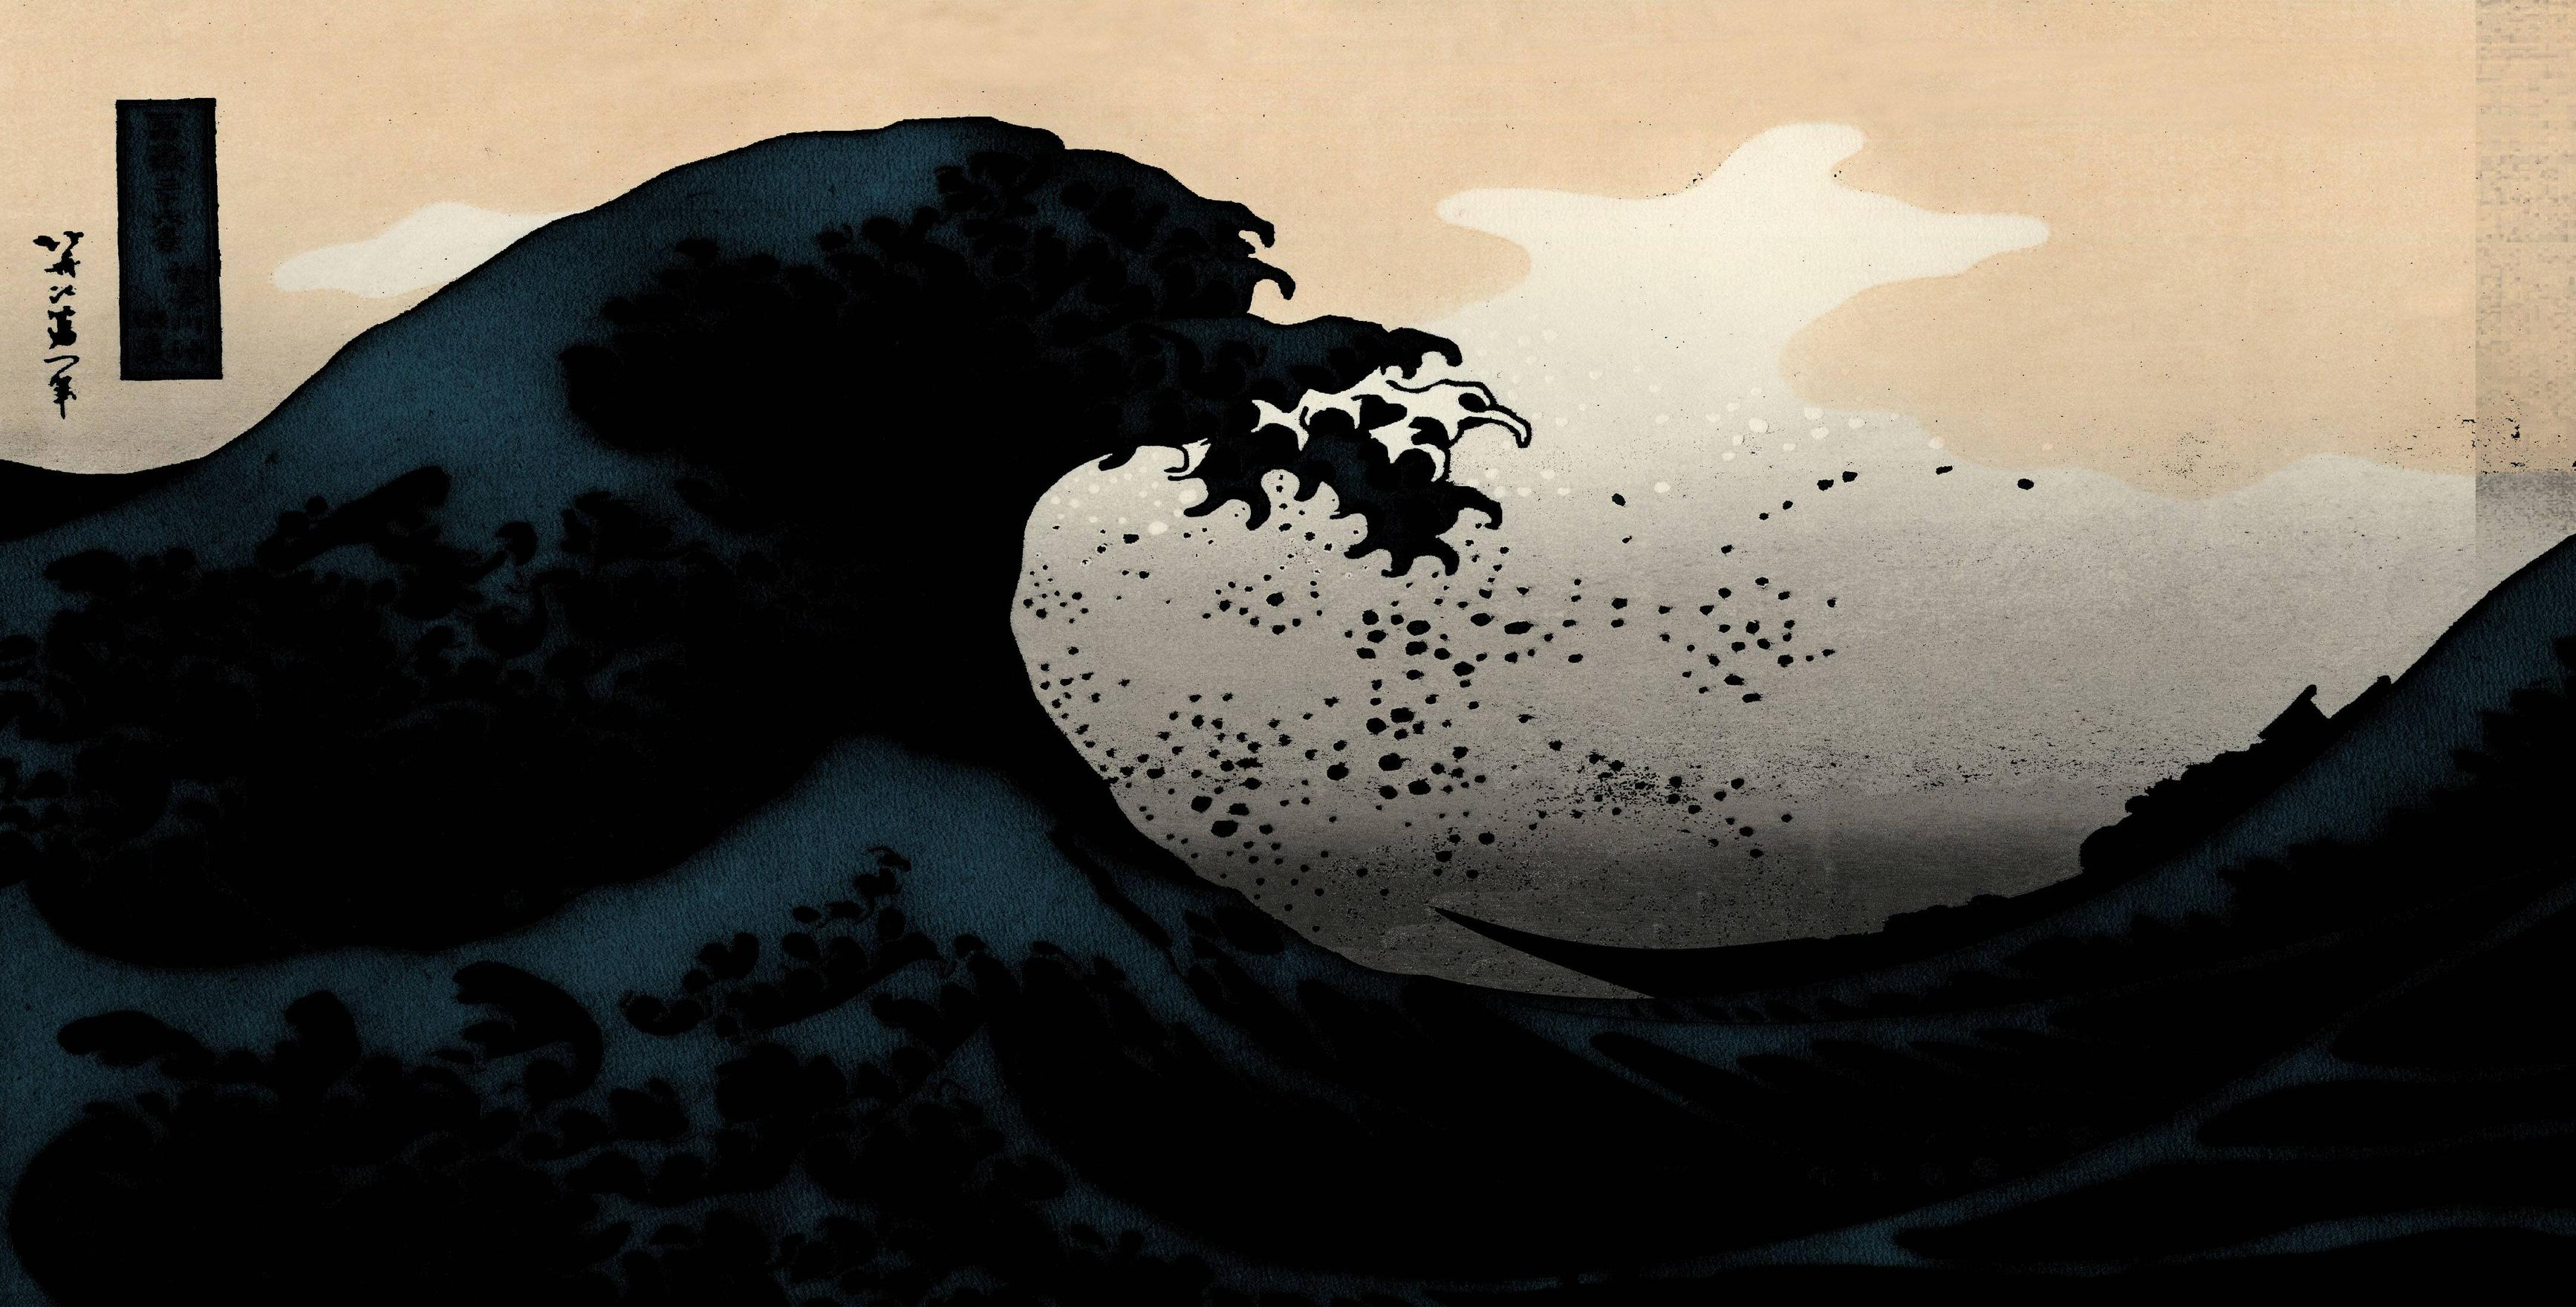 The Great Wave Off Kanagawa Hd Wallpaper Background Image